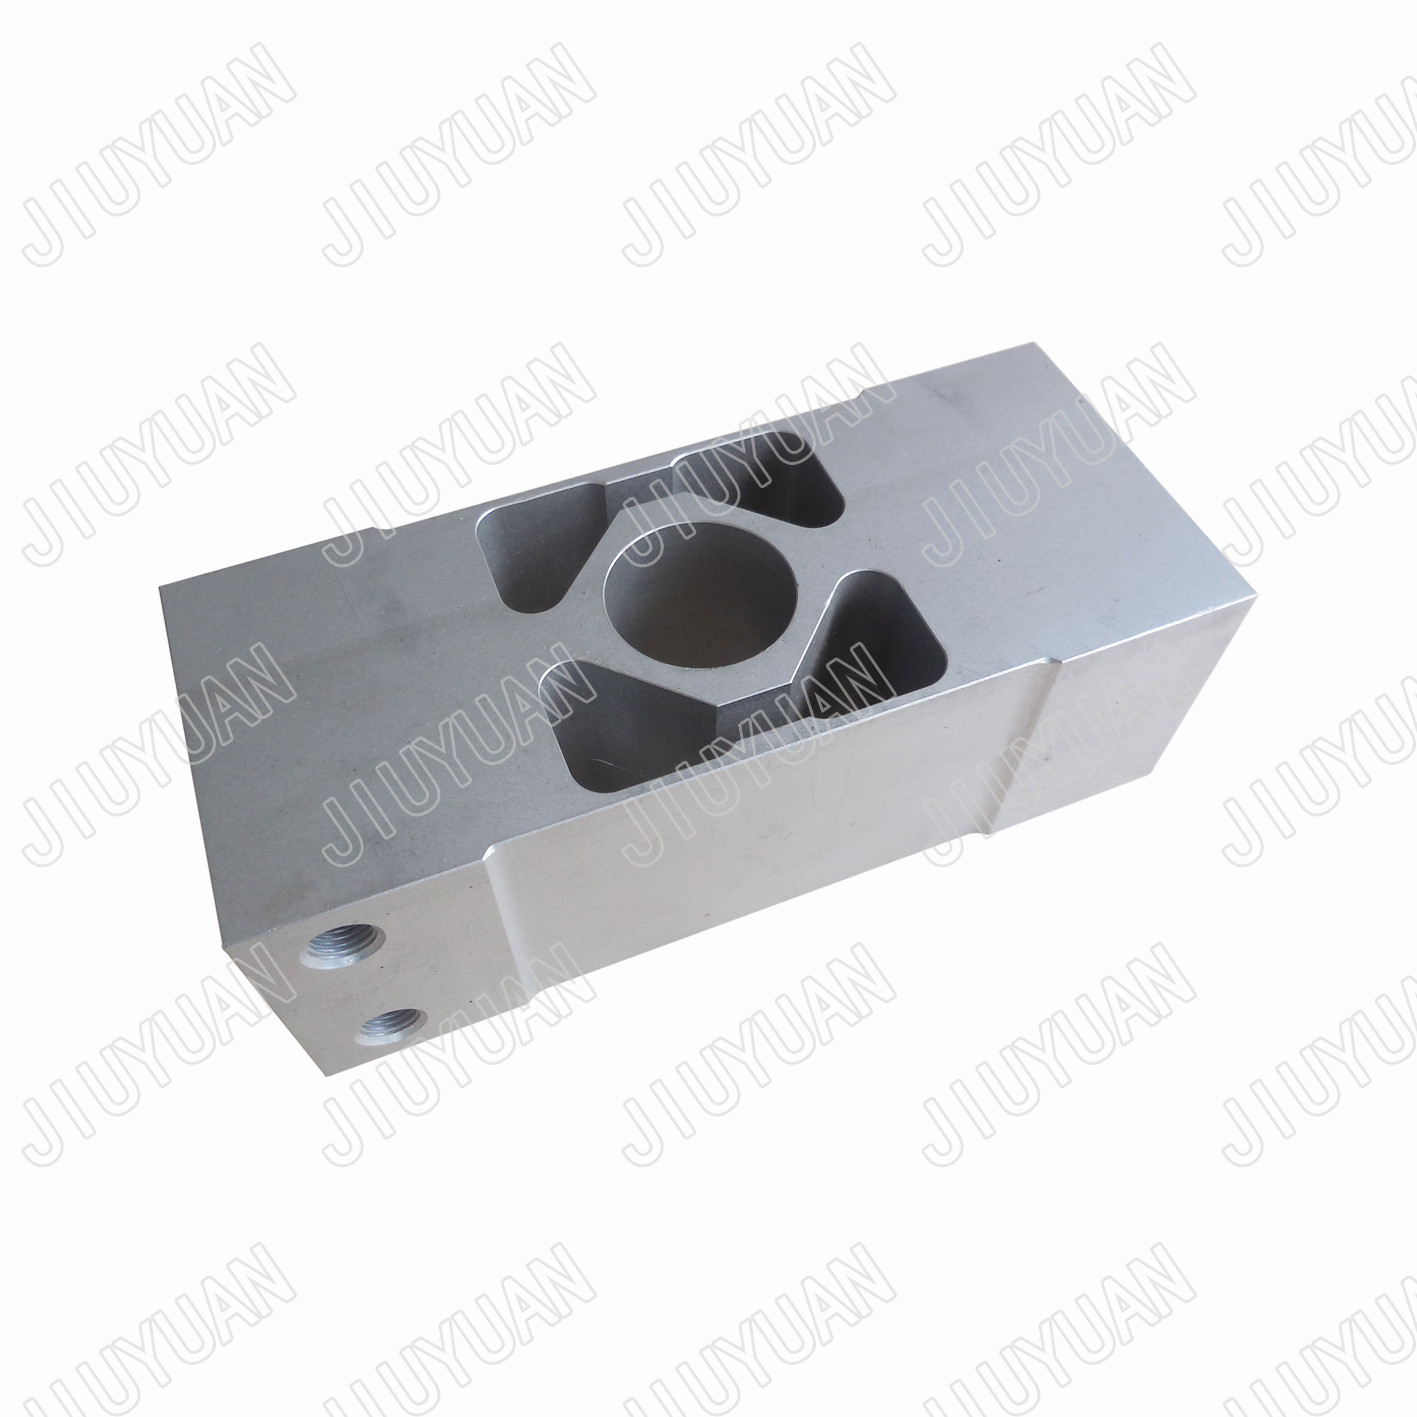 Steel precision CNC machining part